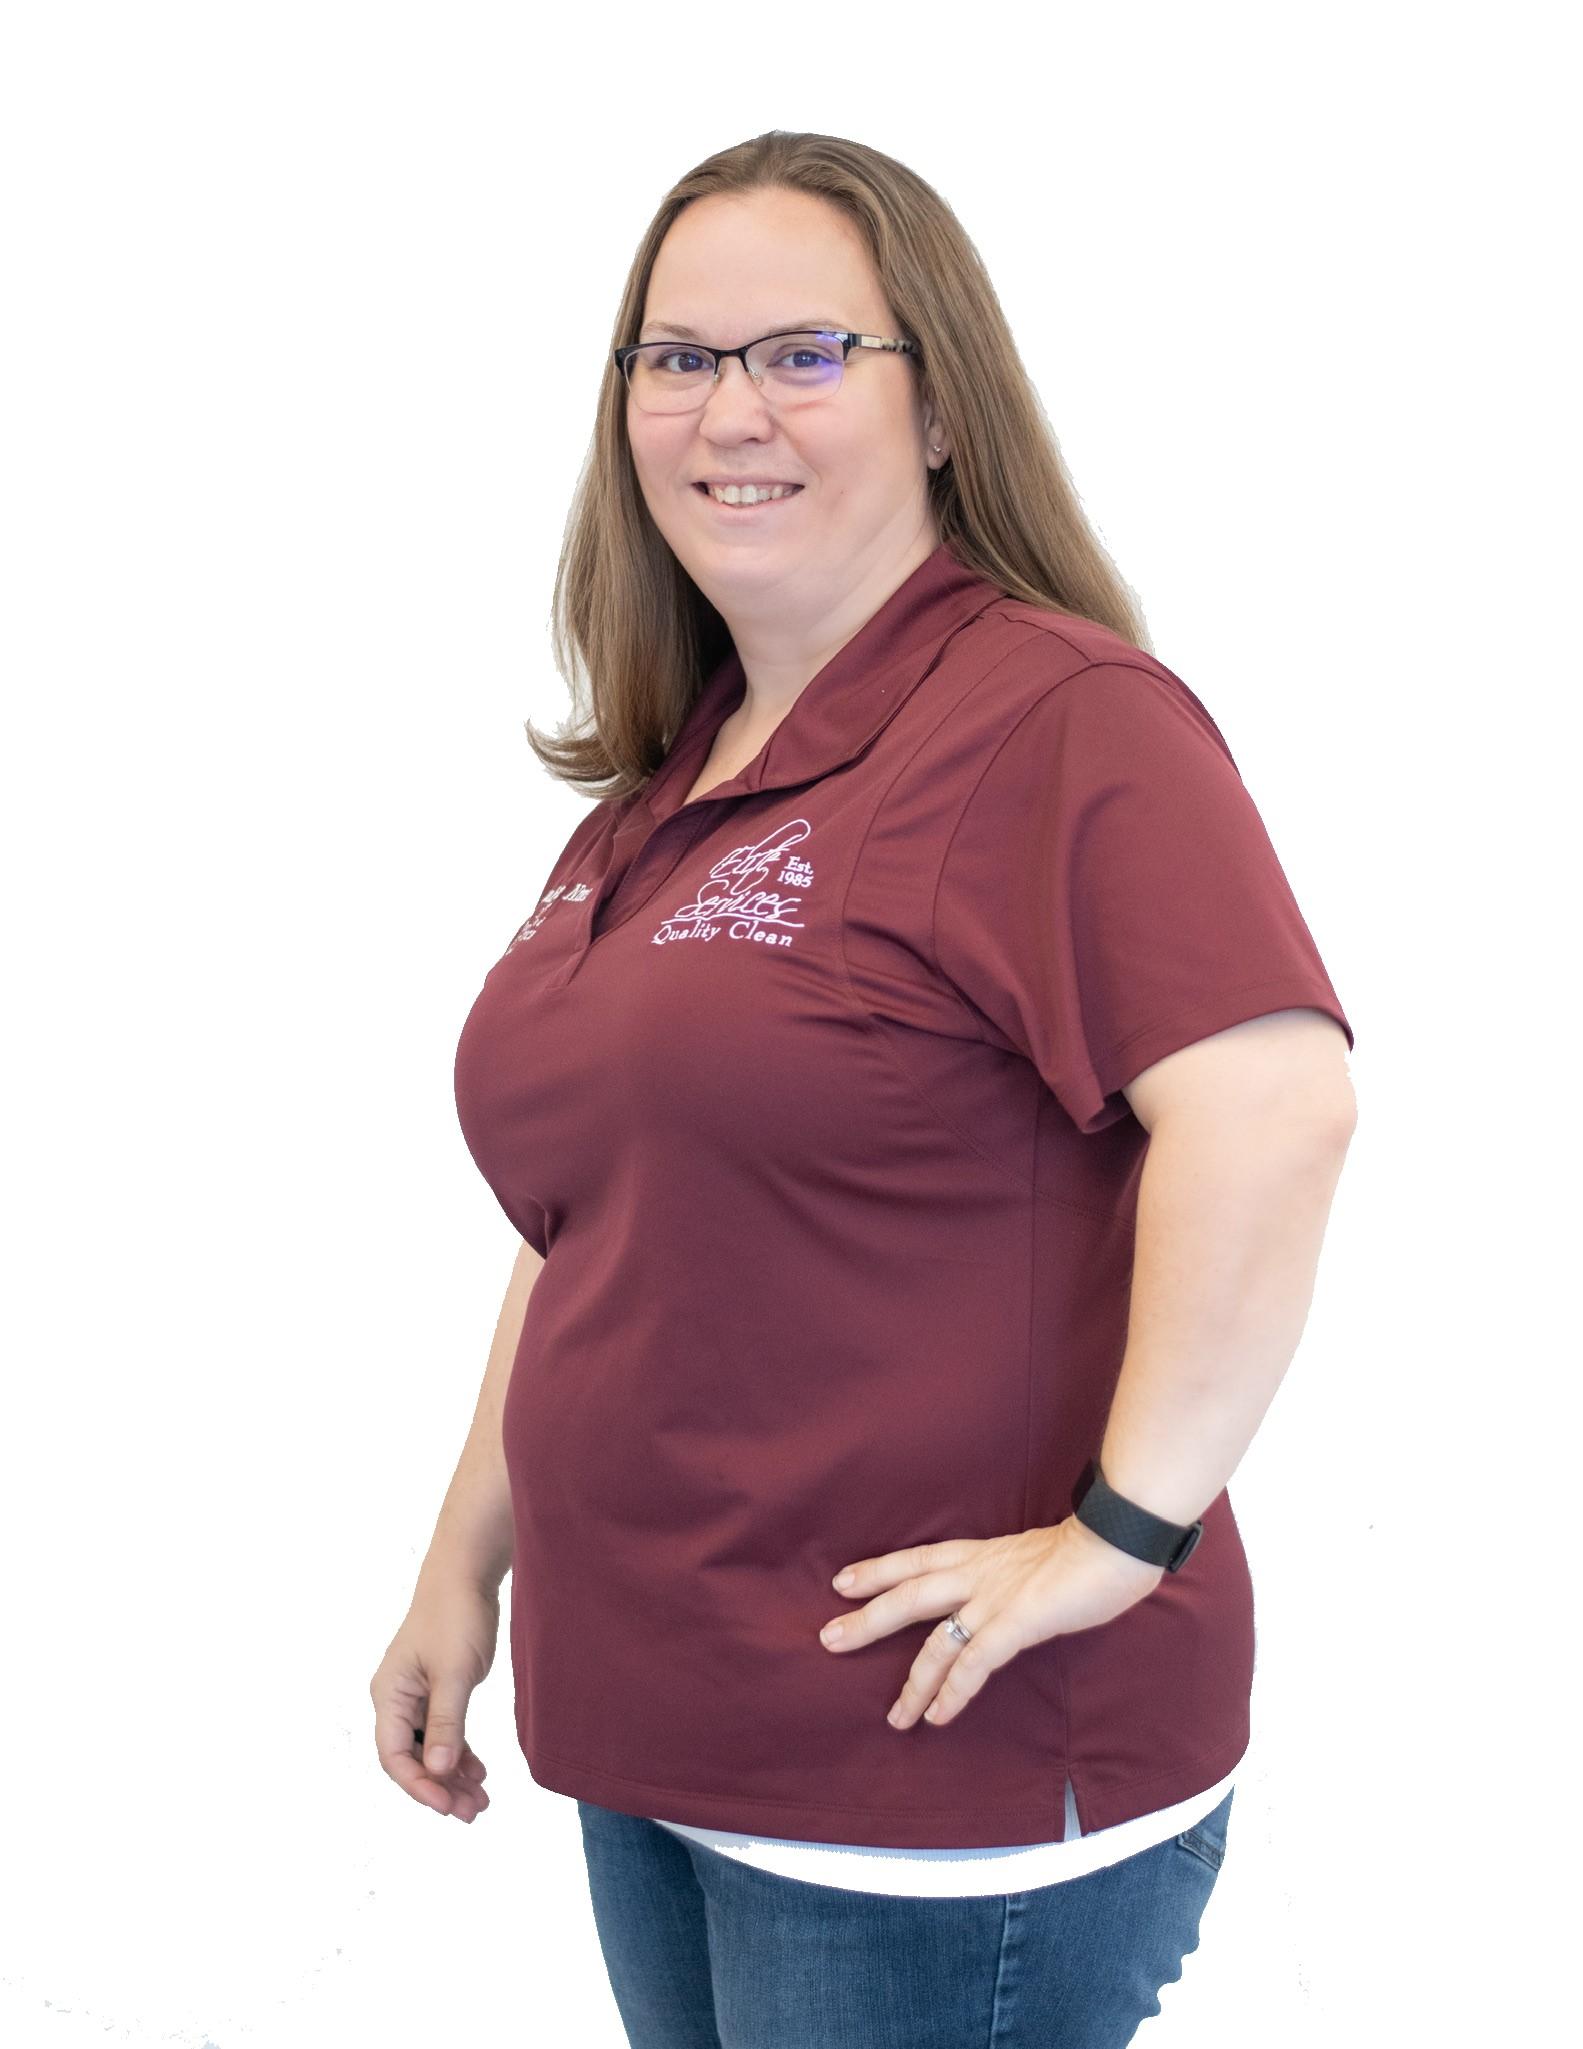 Elizabeth Nims - IICRC Master Textile Cleaning Technician